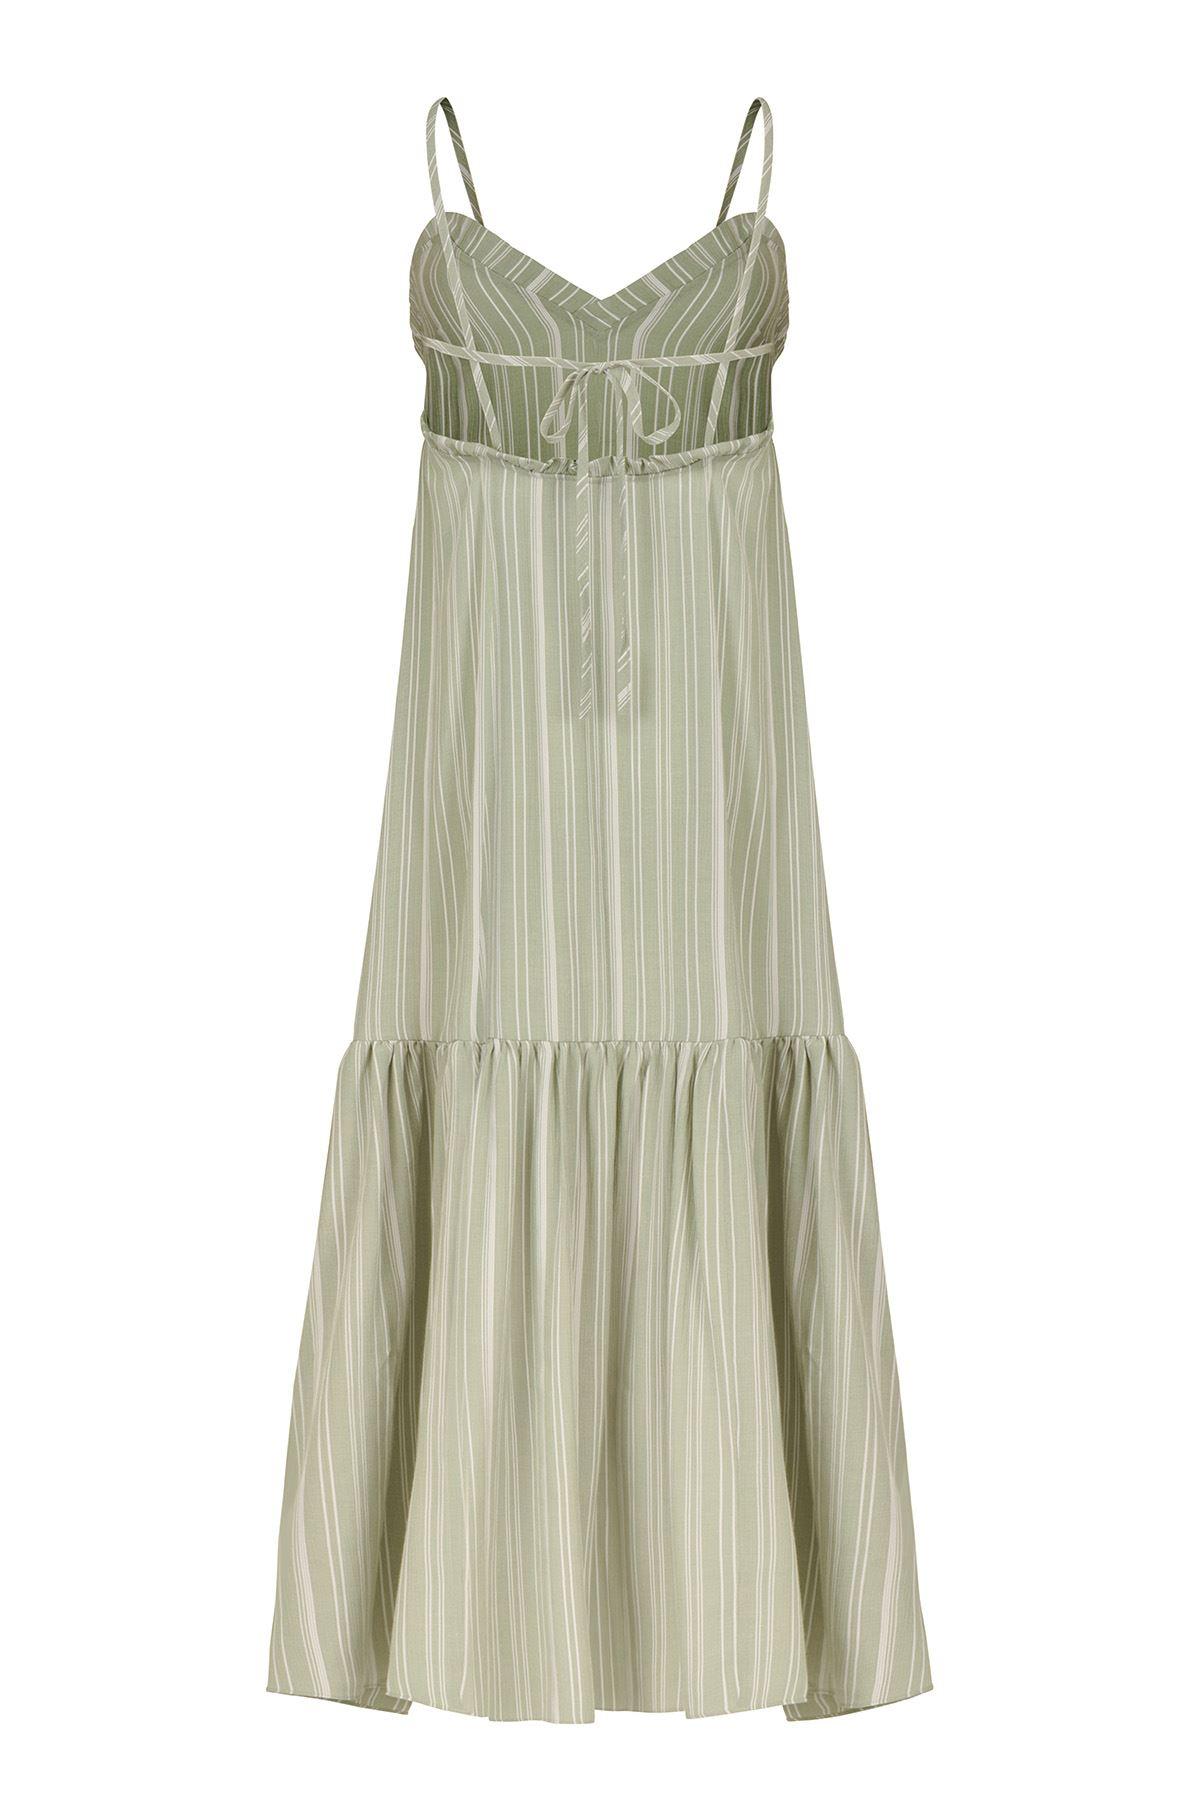 Fırfır Detaylı Maxi Elbise Sırt İpli (Çağla Yeşili Beyaz Çizgili)